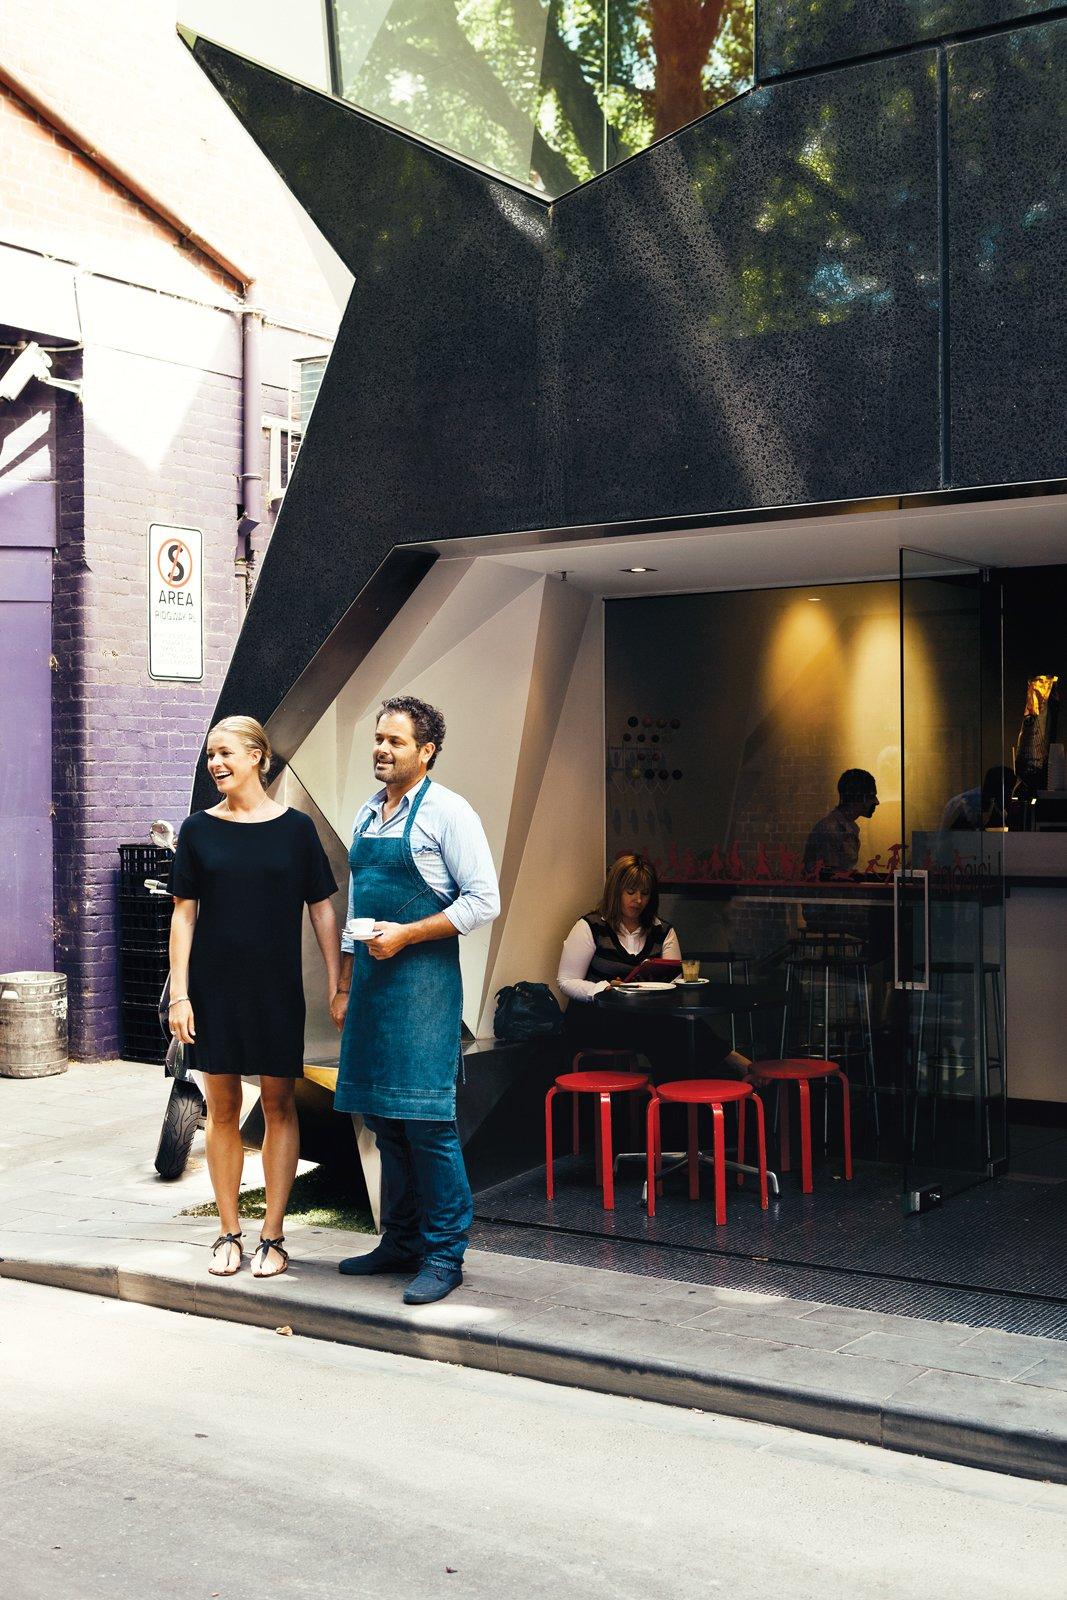 Liaison Cafe Exploring Melbourne, Australia - Photo 4 of 24